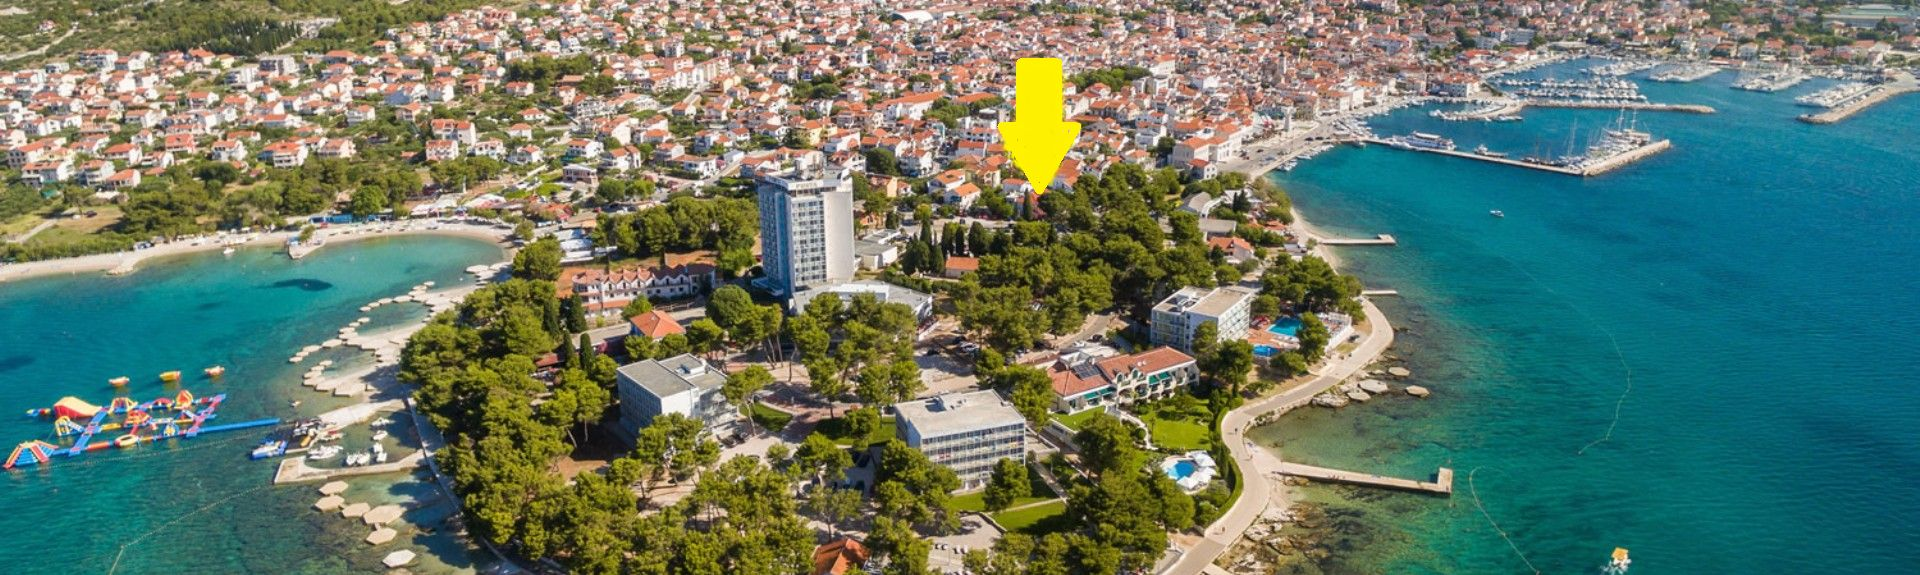 Kaprije, Vodice, Šibenik-Knins län, Kroatien